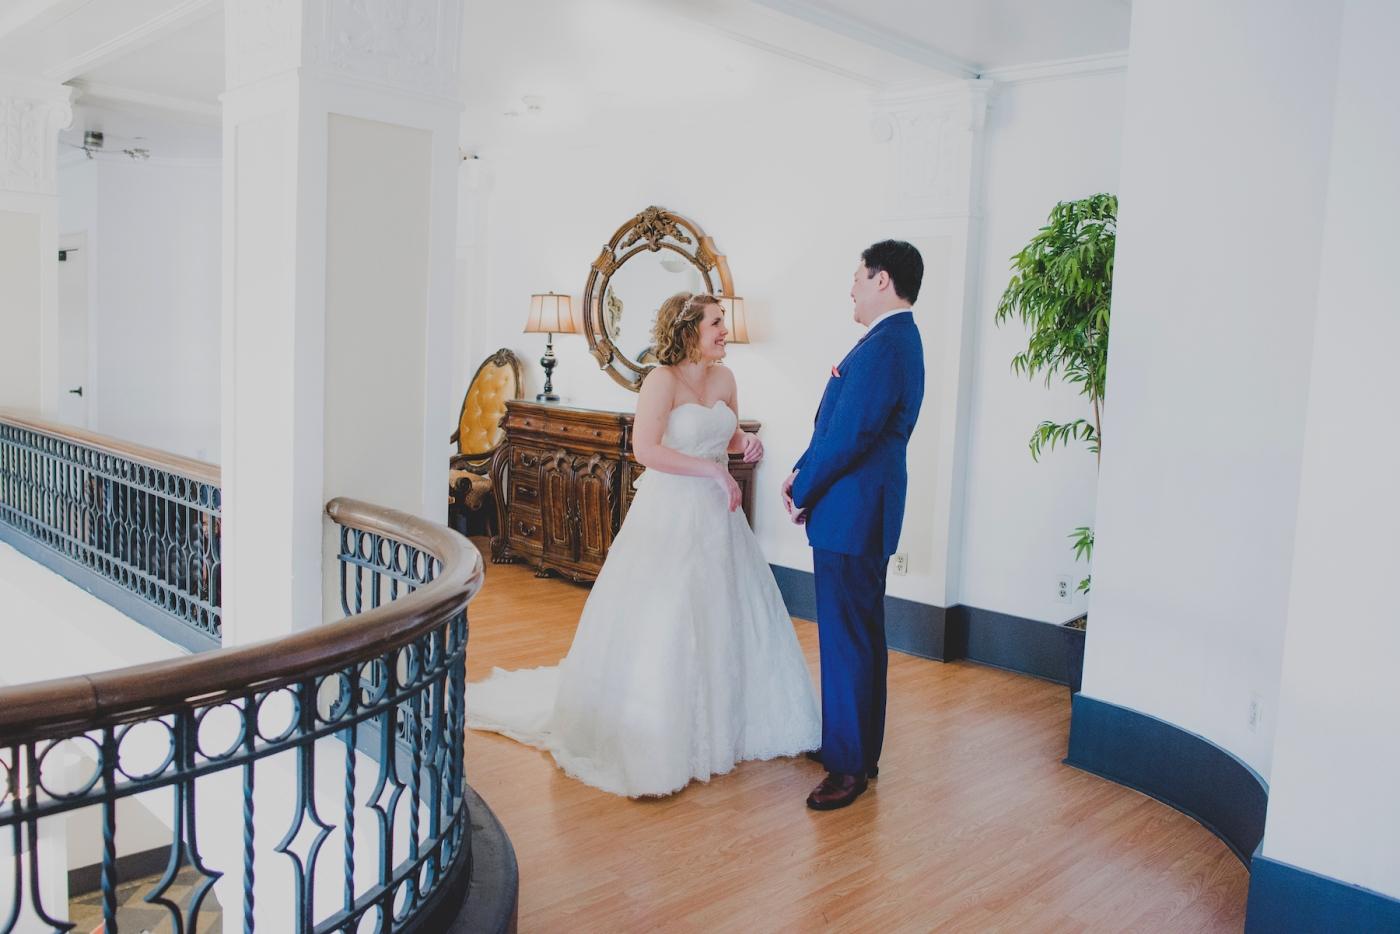 DSC_2044Everett_Wedding_Ballroom_Jane_Speleers_photography_Rachel_and_Edmund_First_look_2017